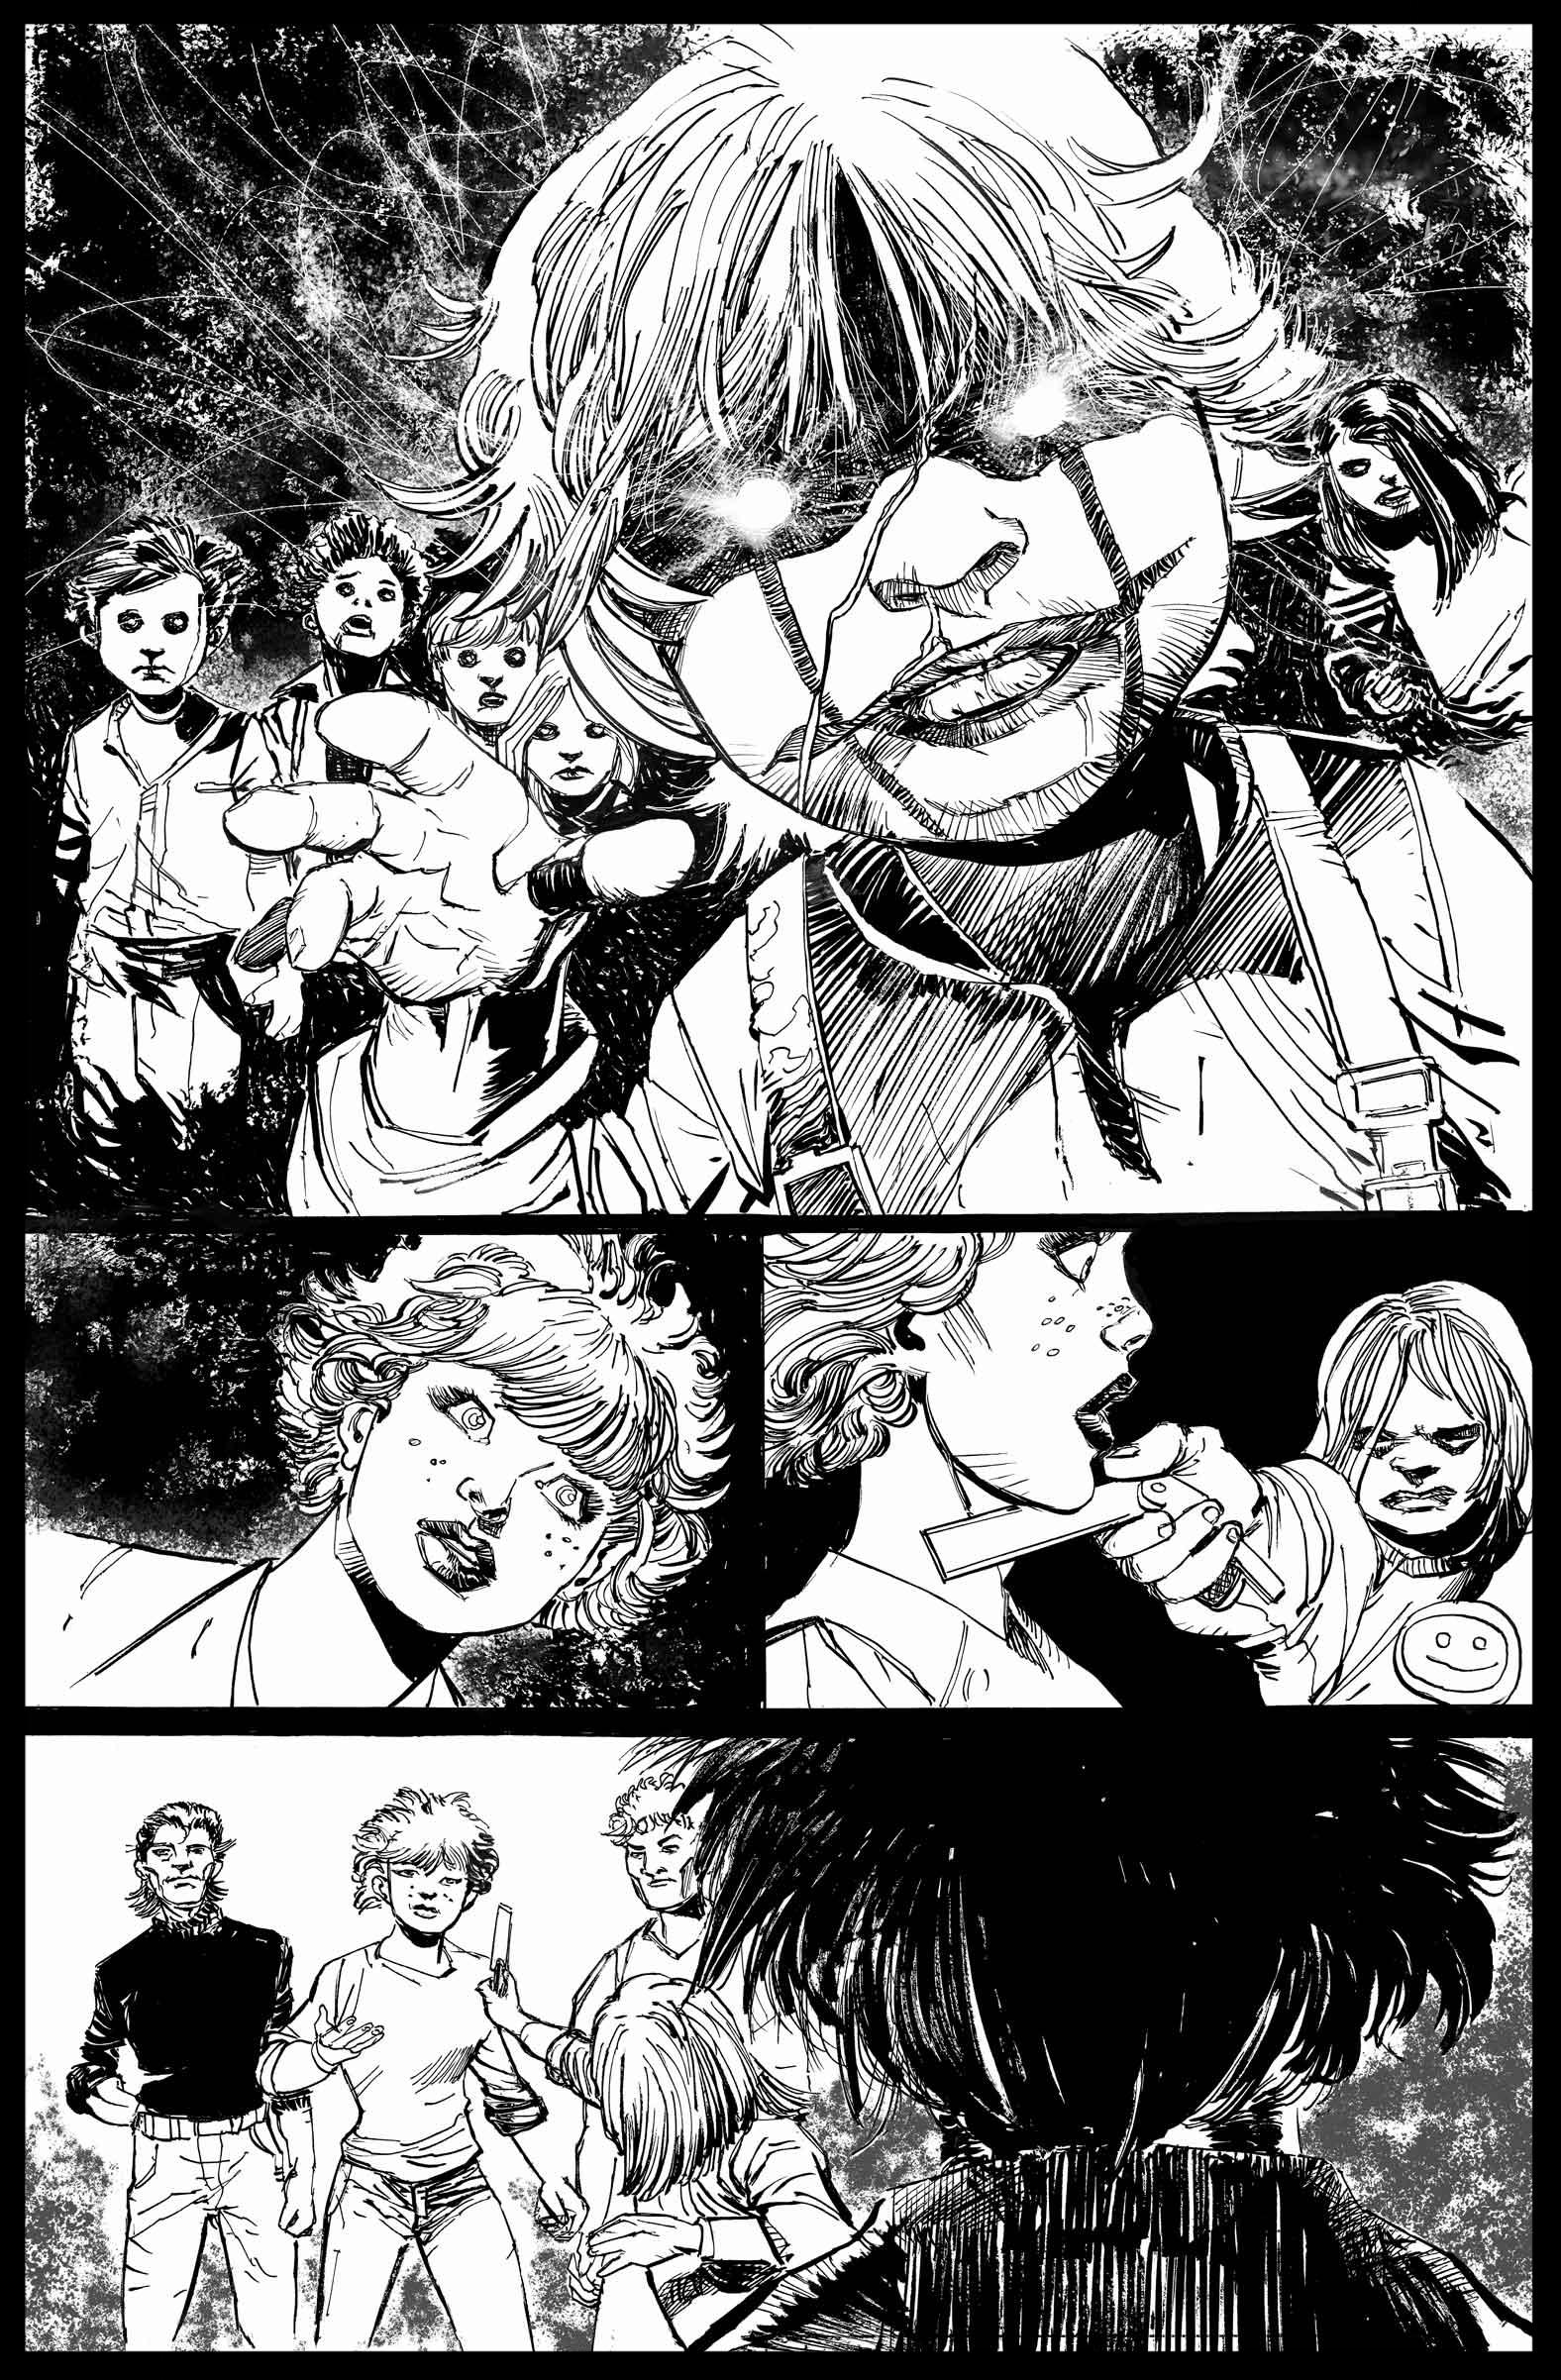 Brimstone #6 - Page 1 - Pencils & Inks